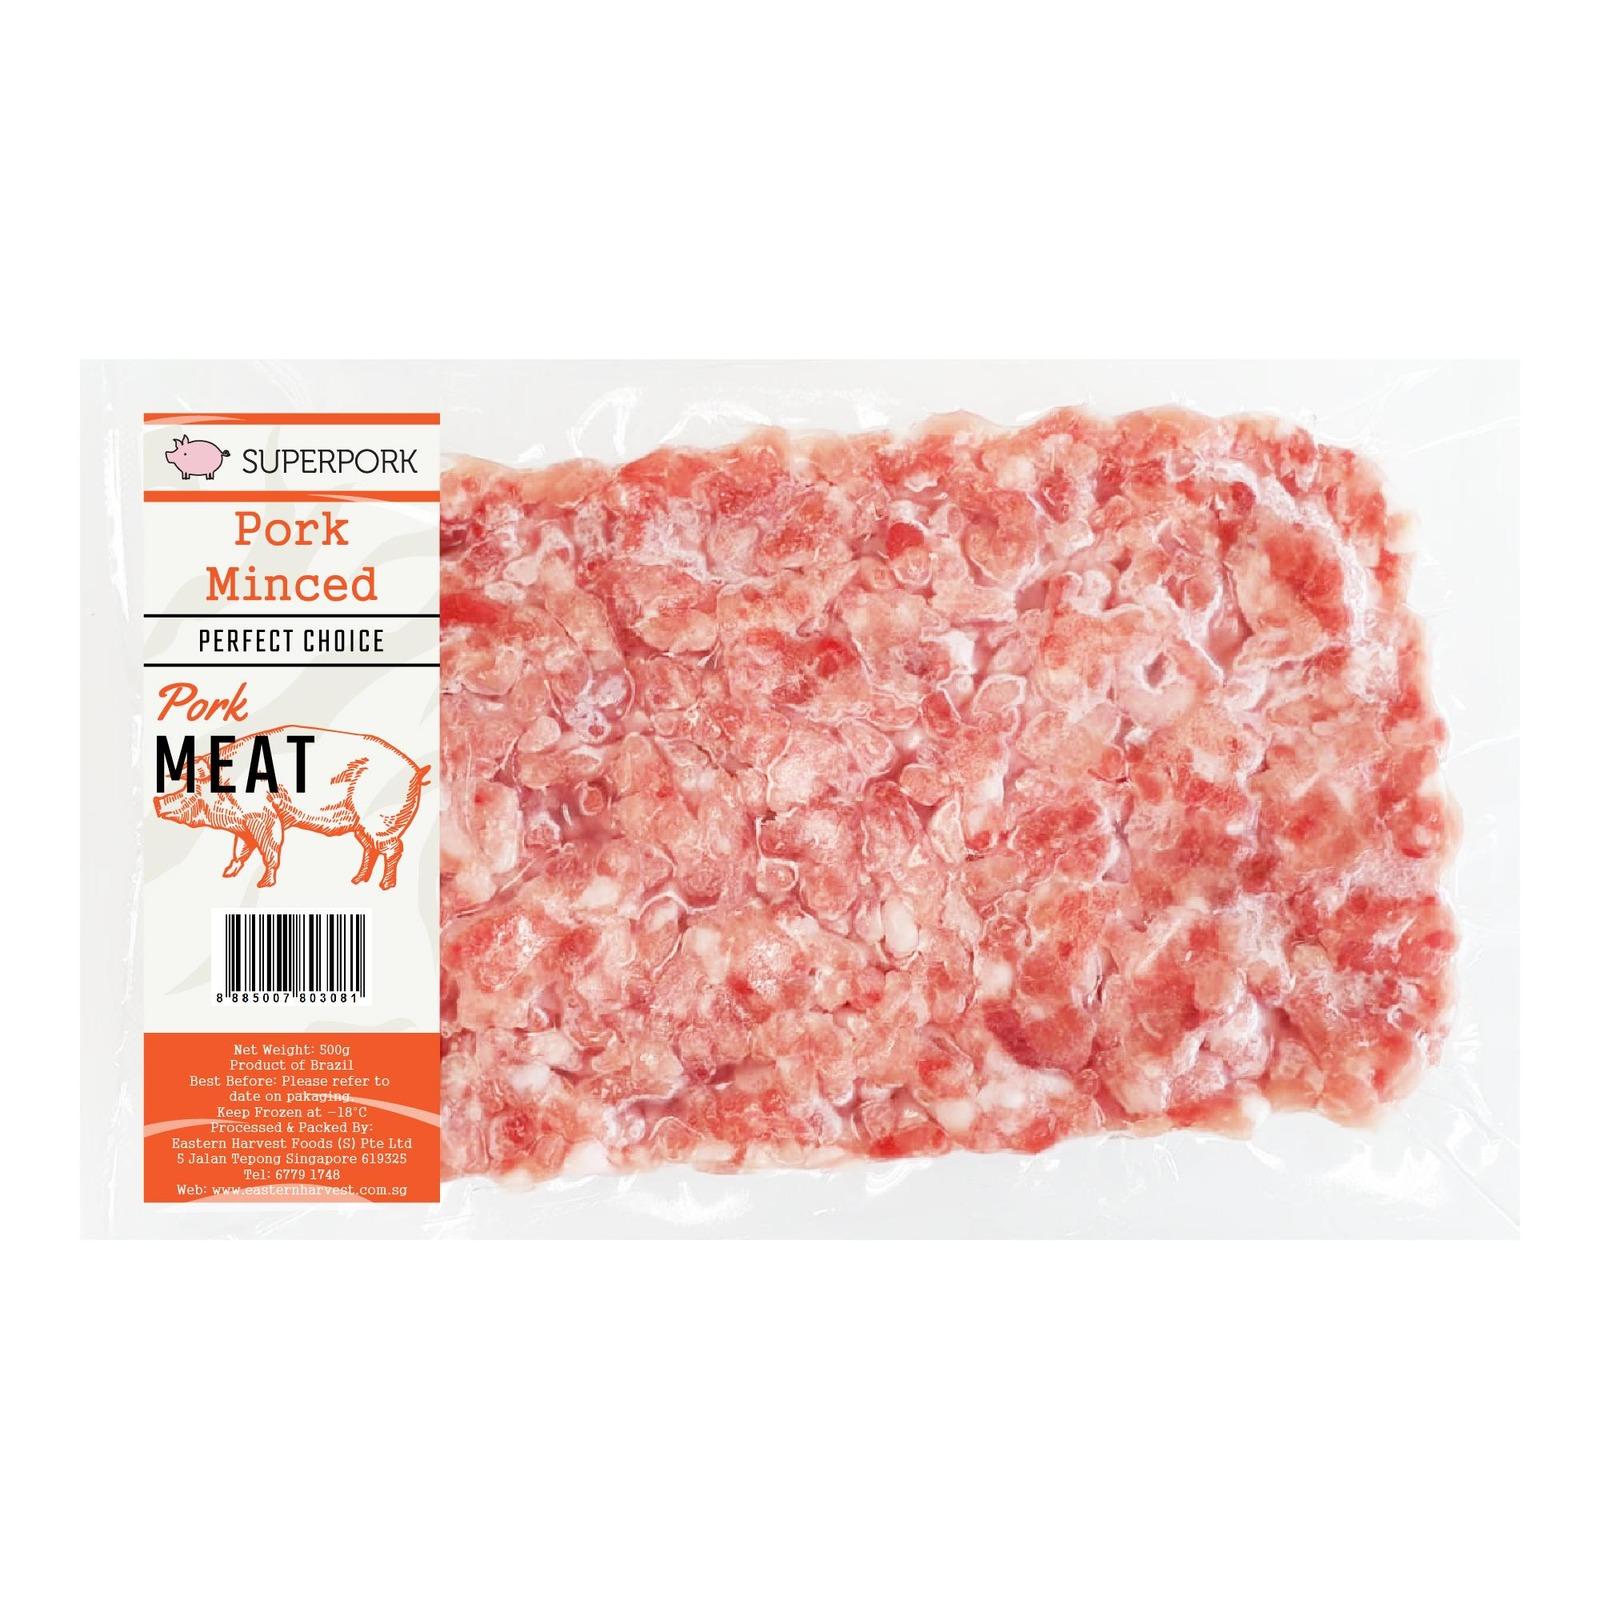 Superpork Pork Minced Meat